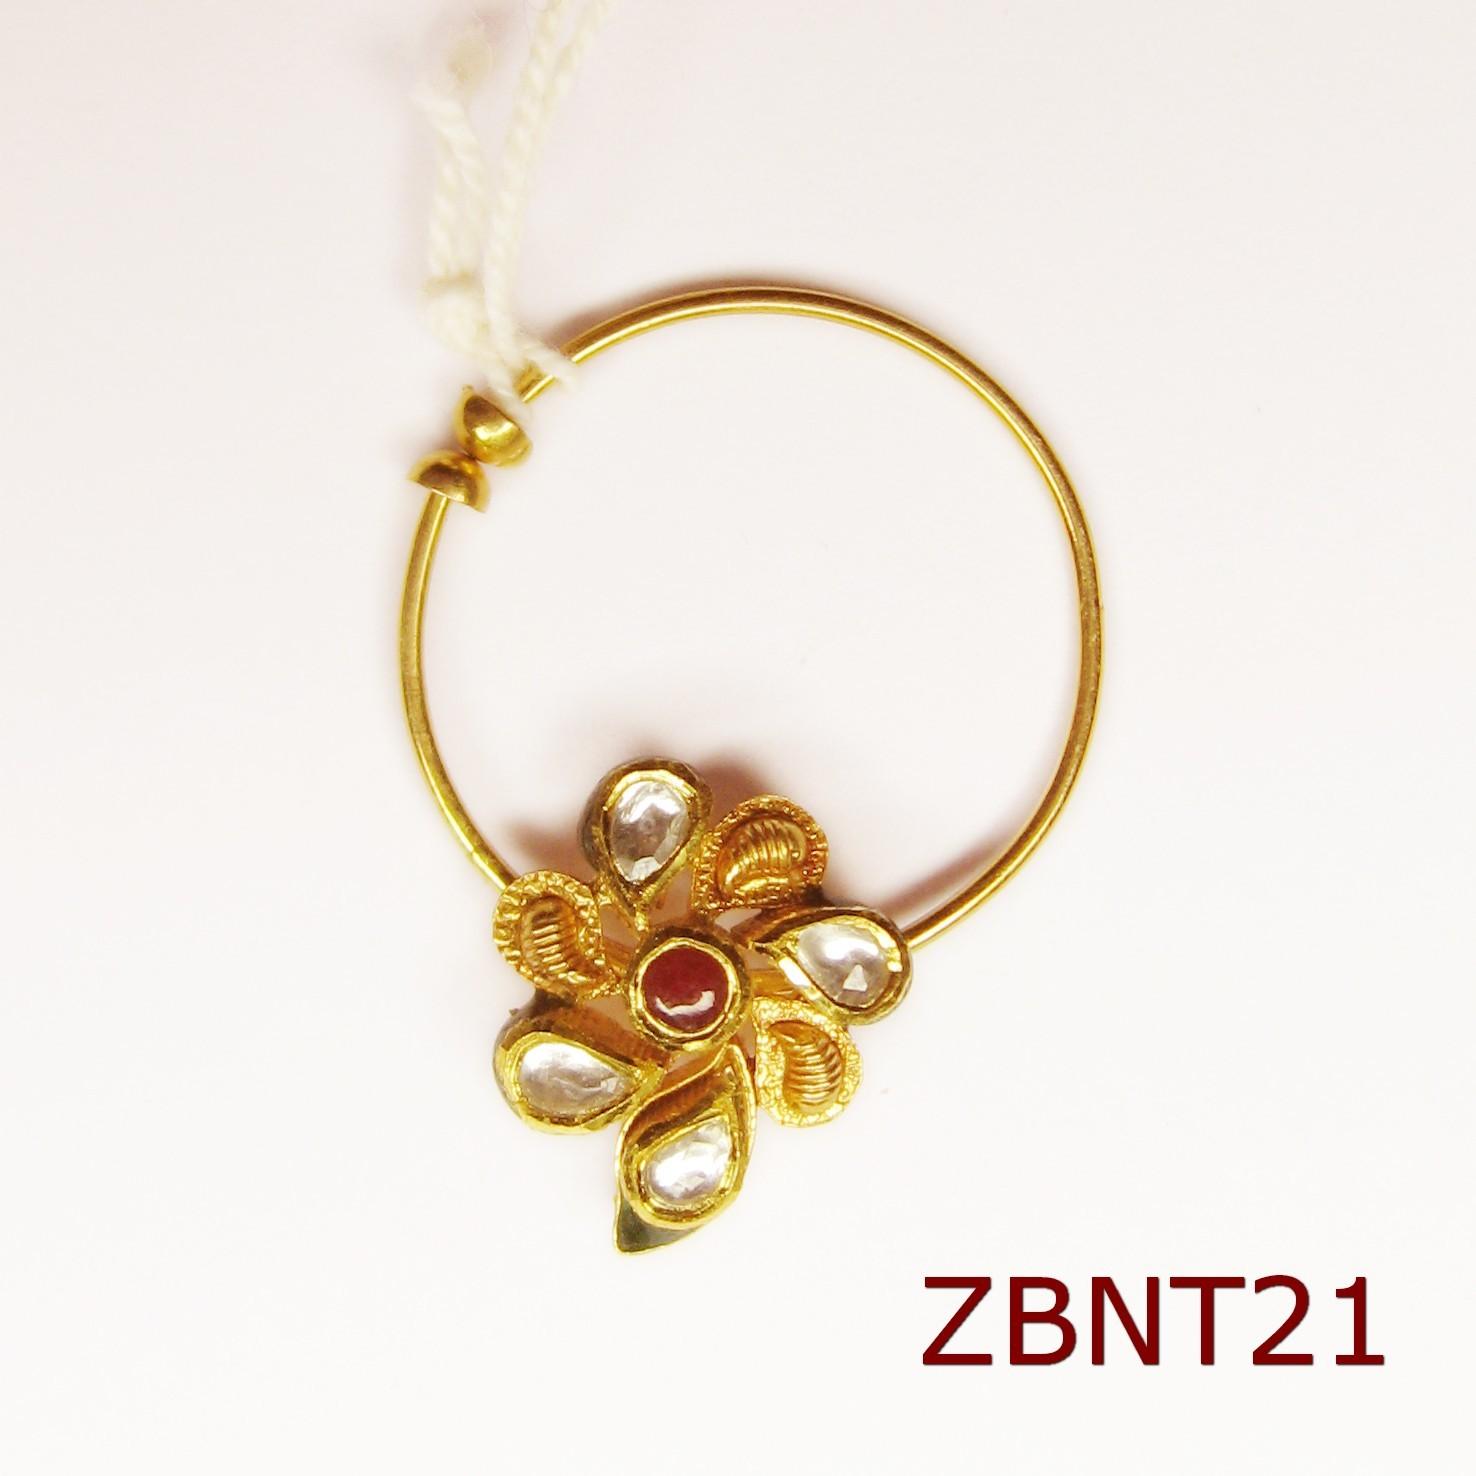 ZBNT21